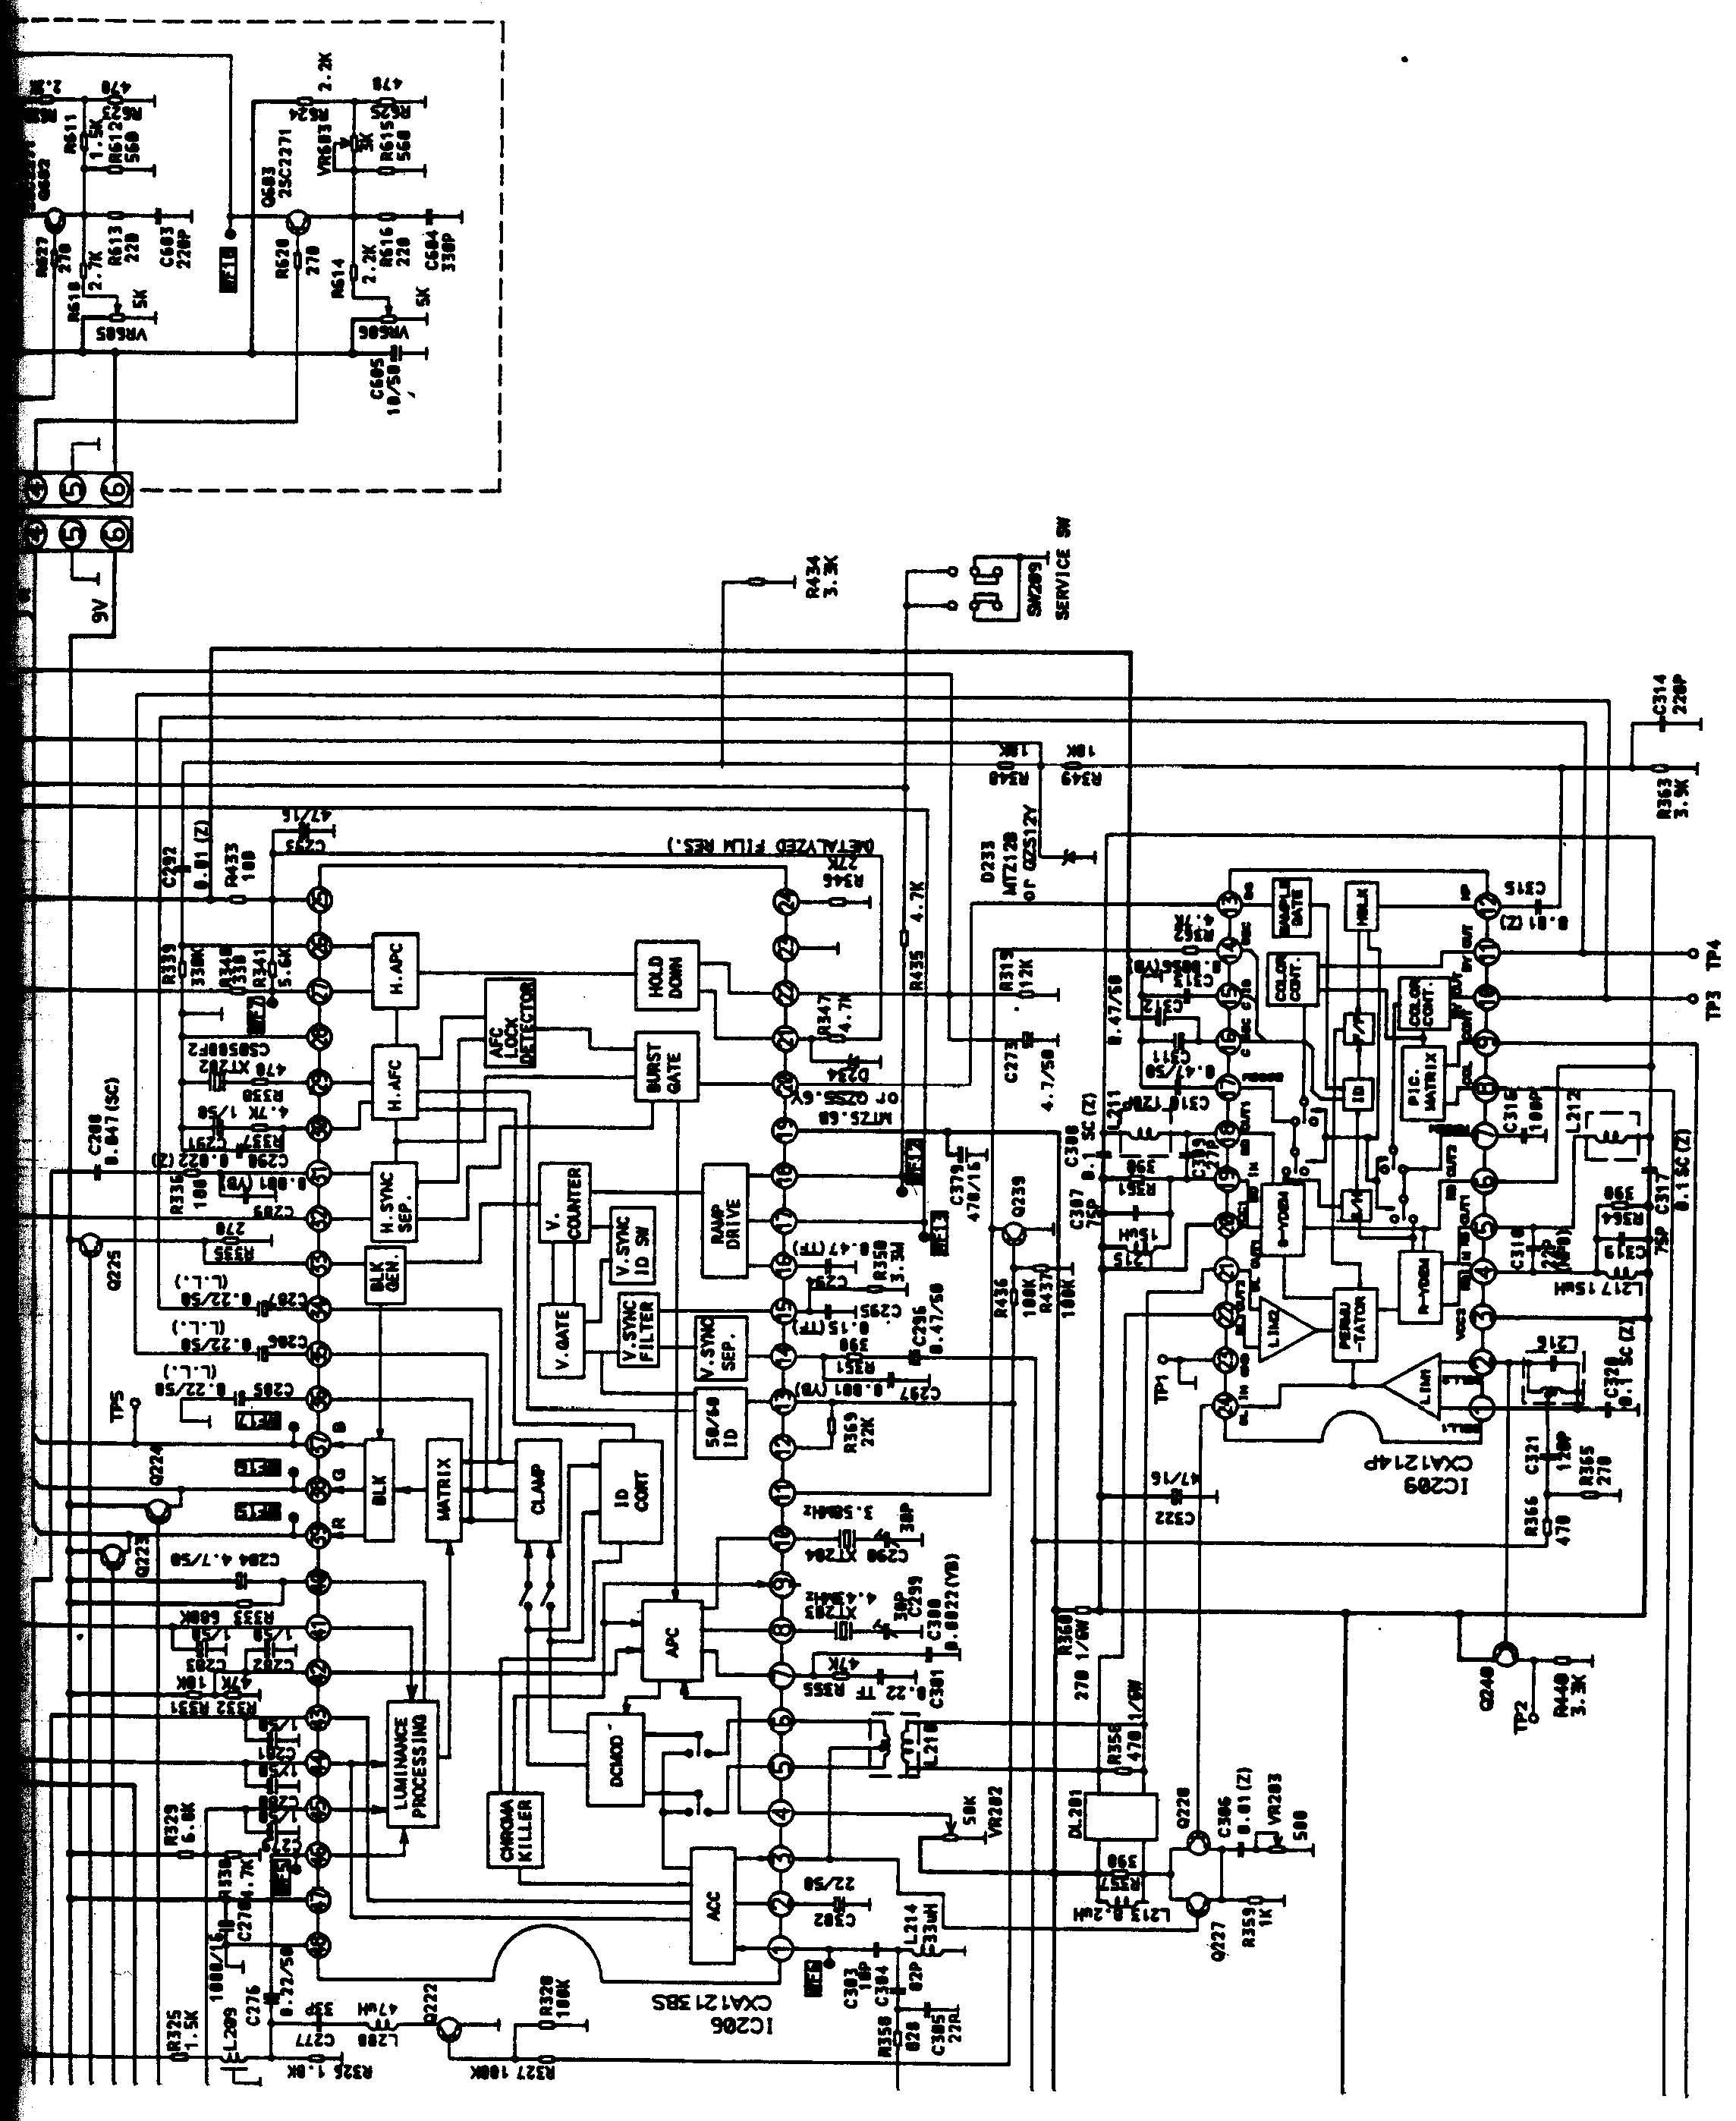 funai 2000 mk 7 schematic diagram in pdf format